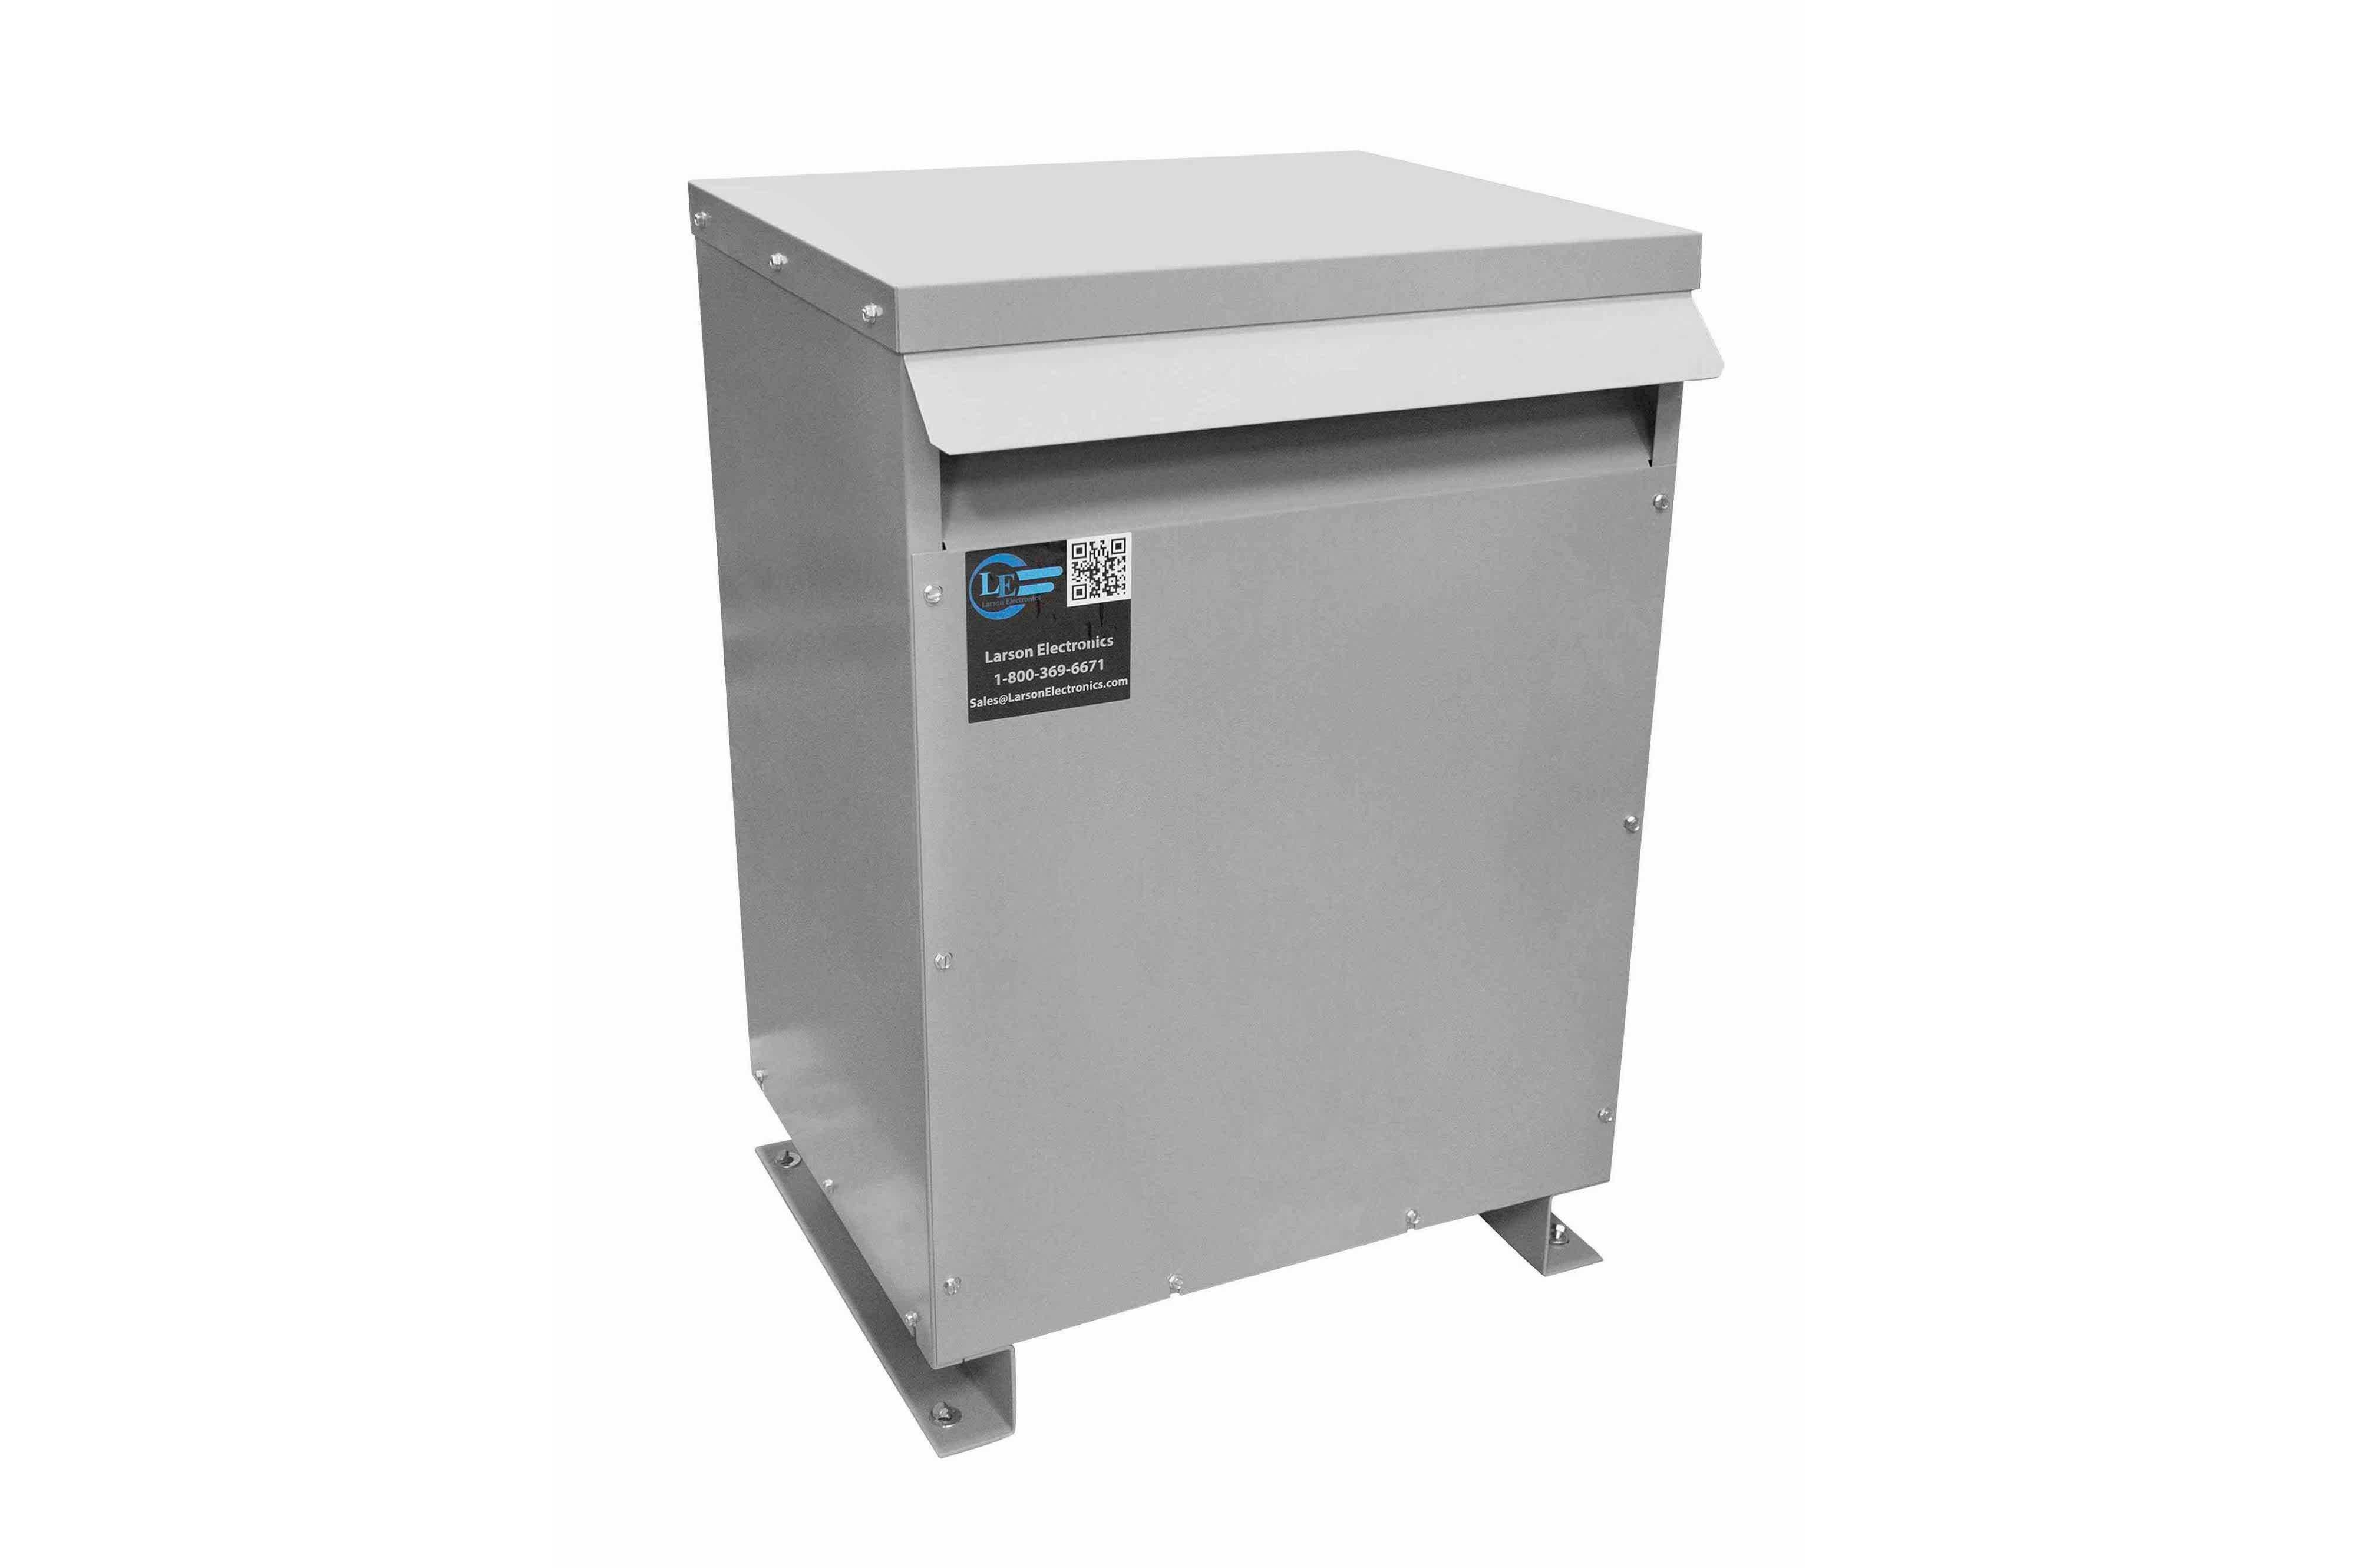 275 kVA 3PH Isolation Transformer, 208V Wye Primary, 600V Delta Secondary, N3R, Ventilated, 60 Hz